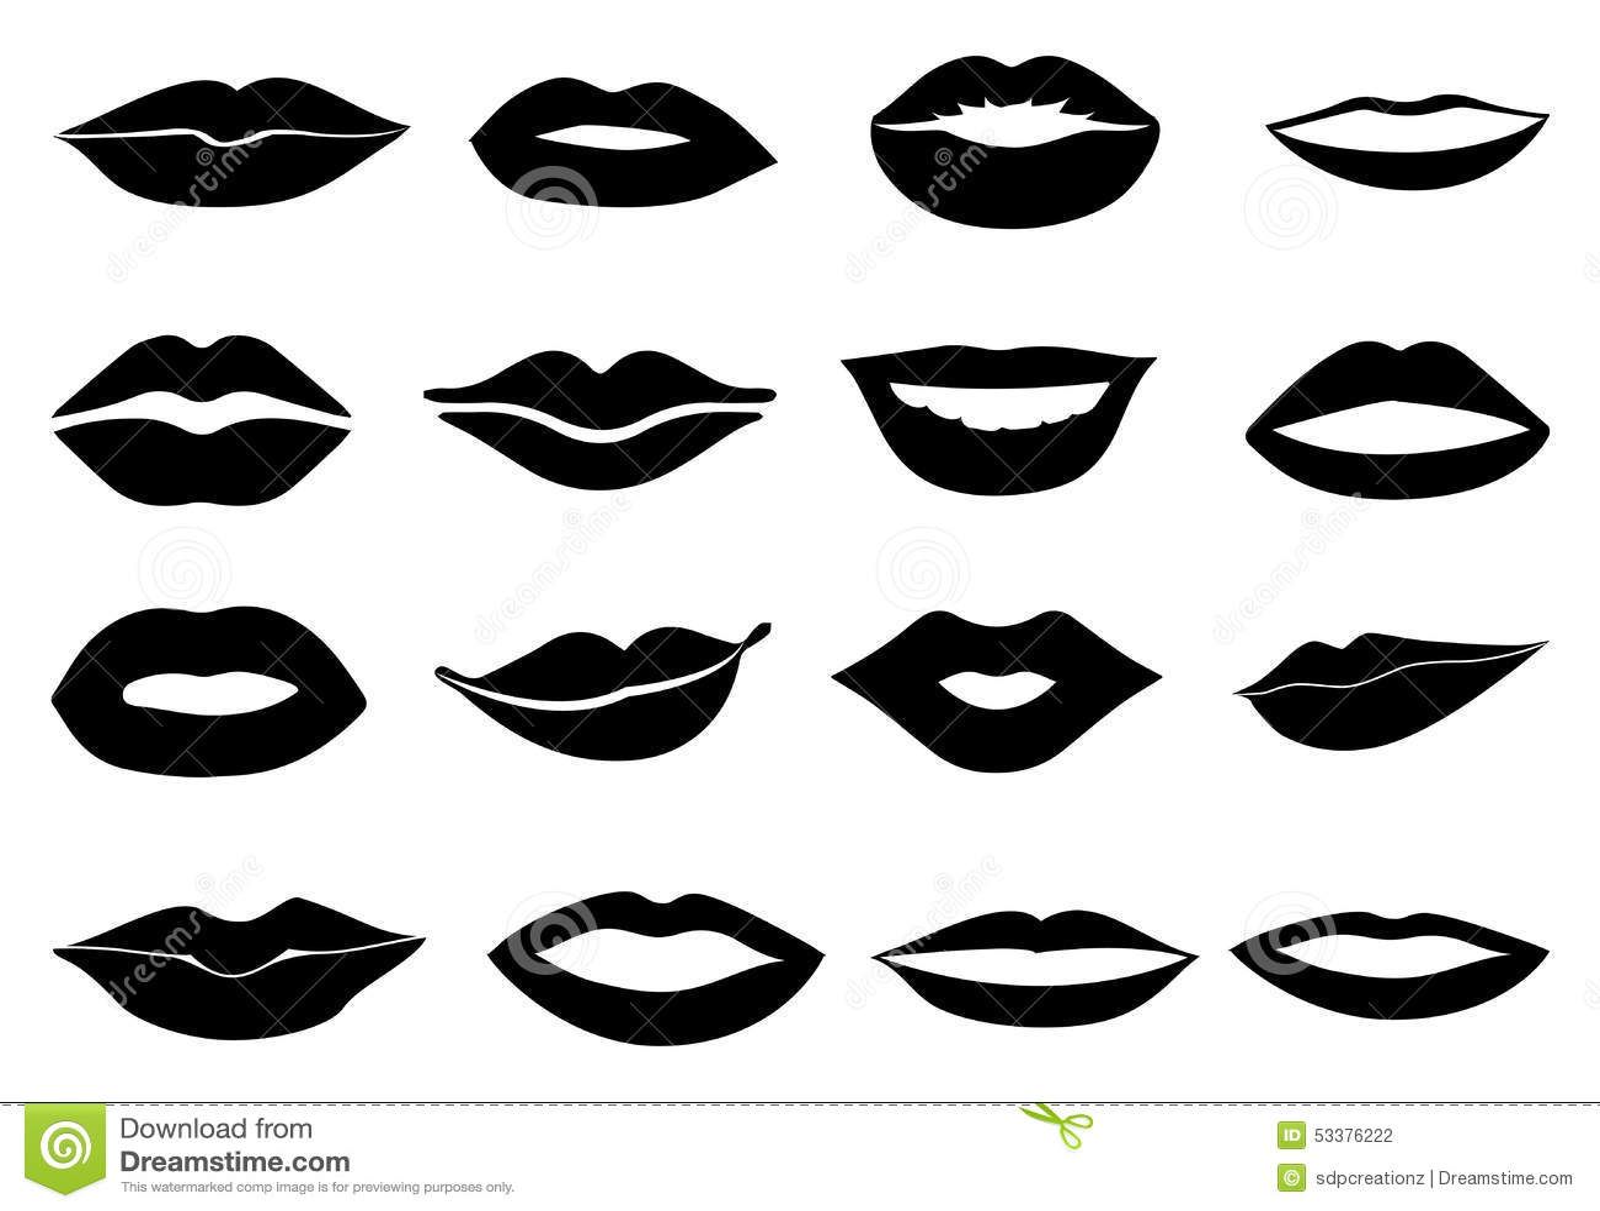 Lips Icons Set Stock Vector - Image: 53376222